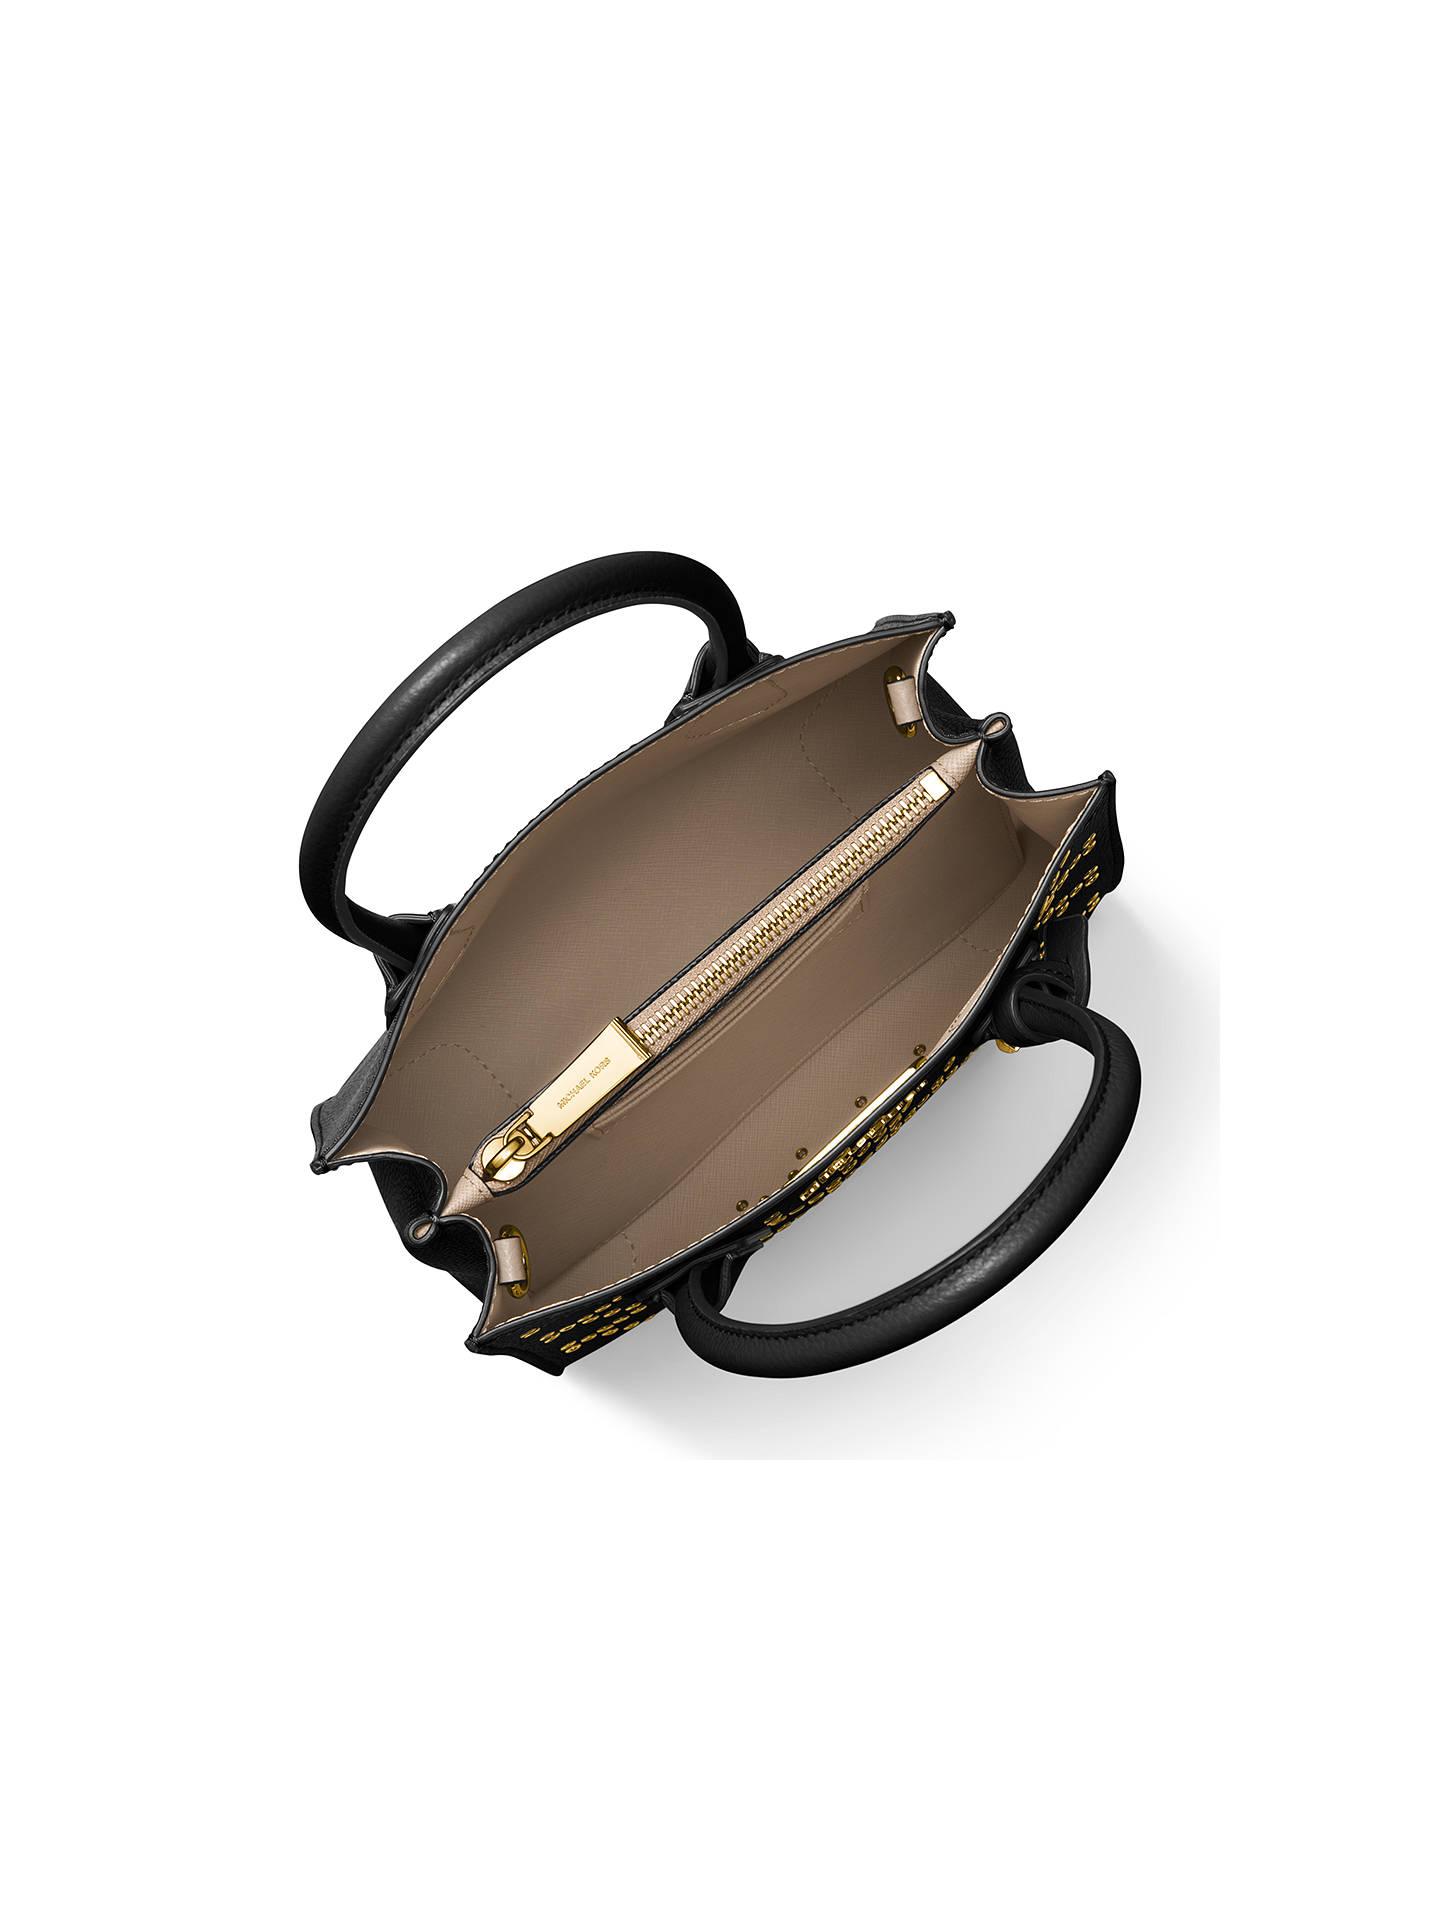 7c671f1f496176 ... Buy MICHAEL Michael Kors Mercer Stud Medium Leather Tote Bag,  Black/Gold Online at ...